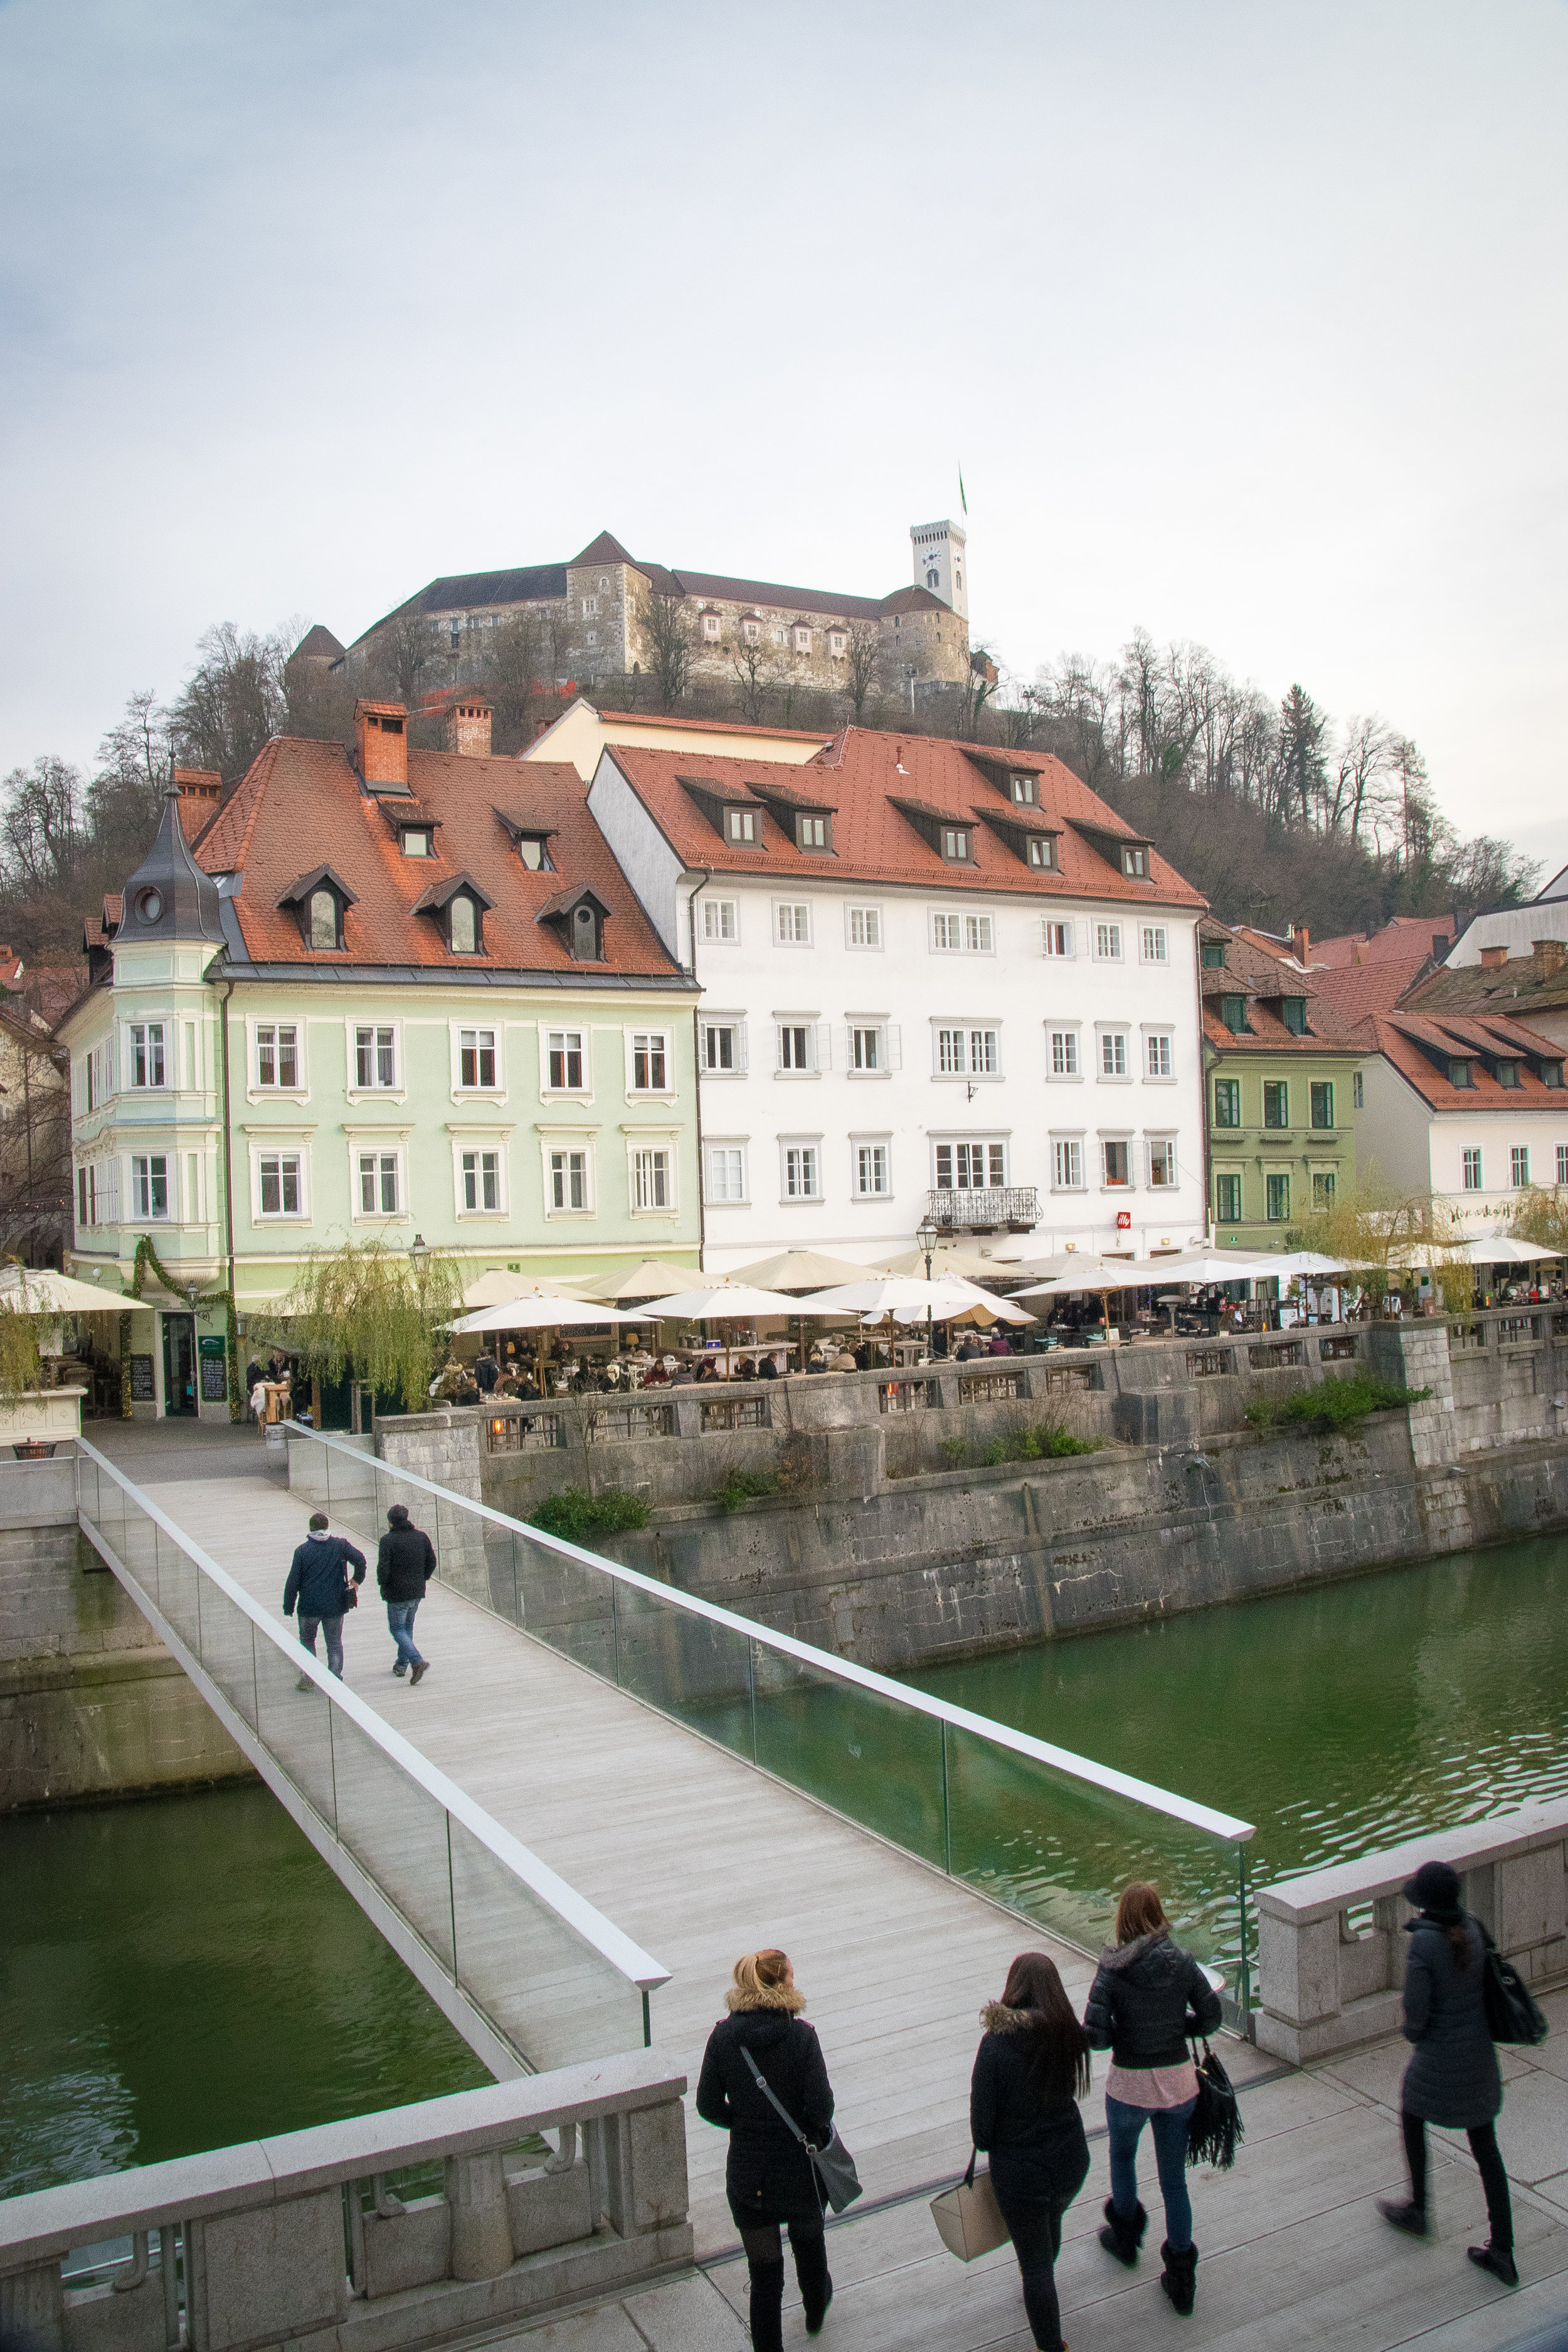 the castle looks over Ljubjlana